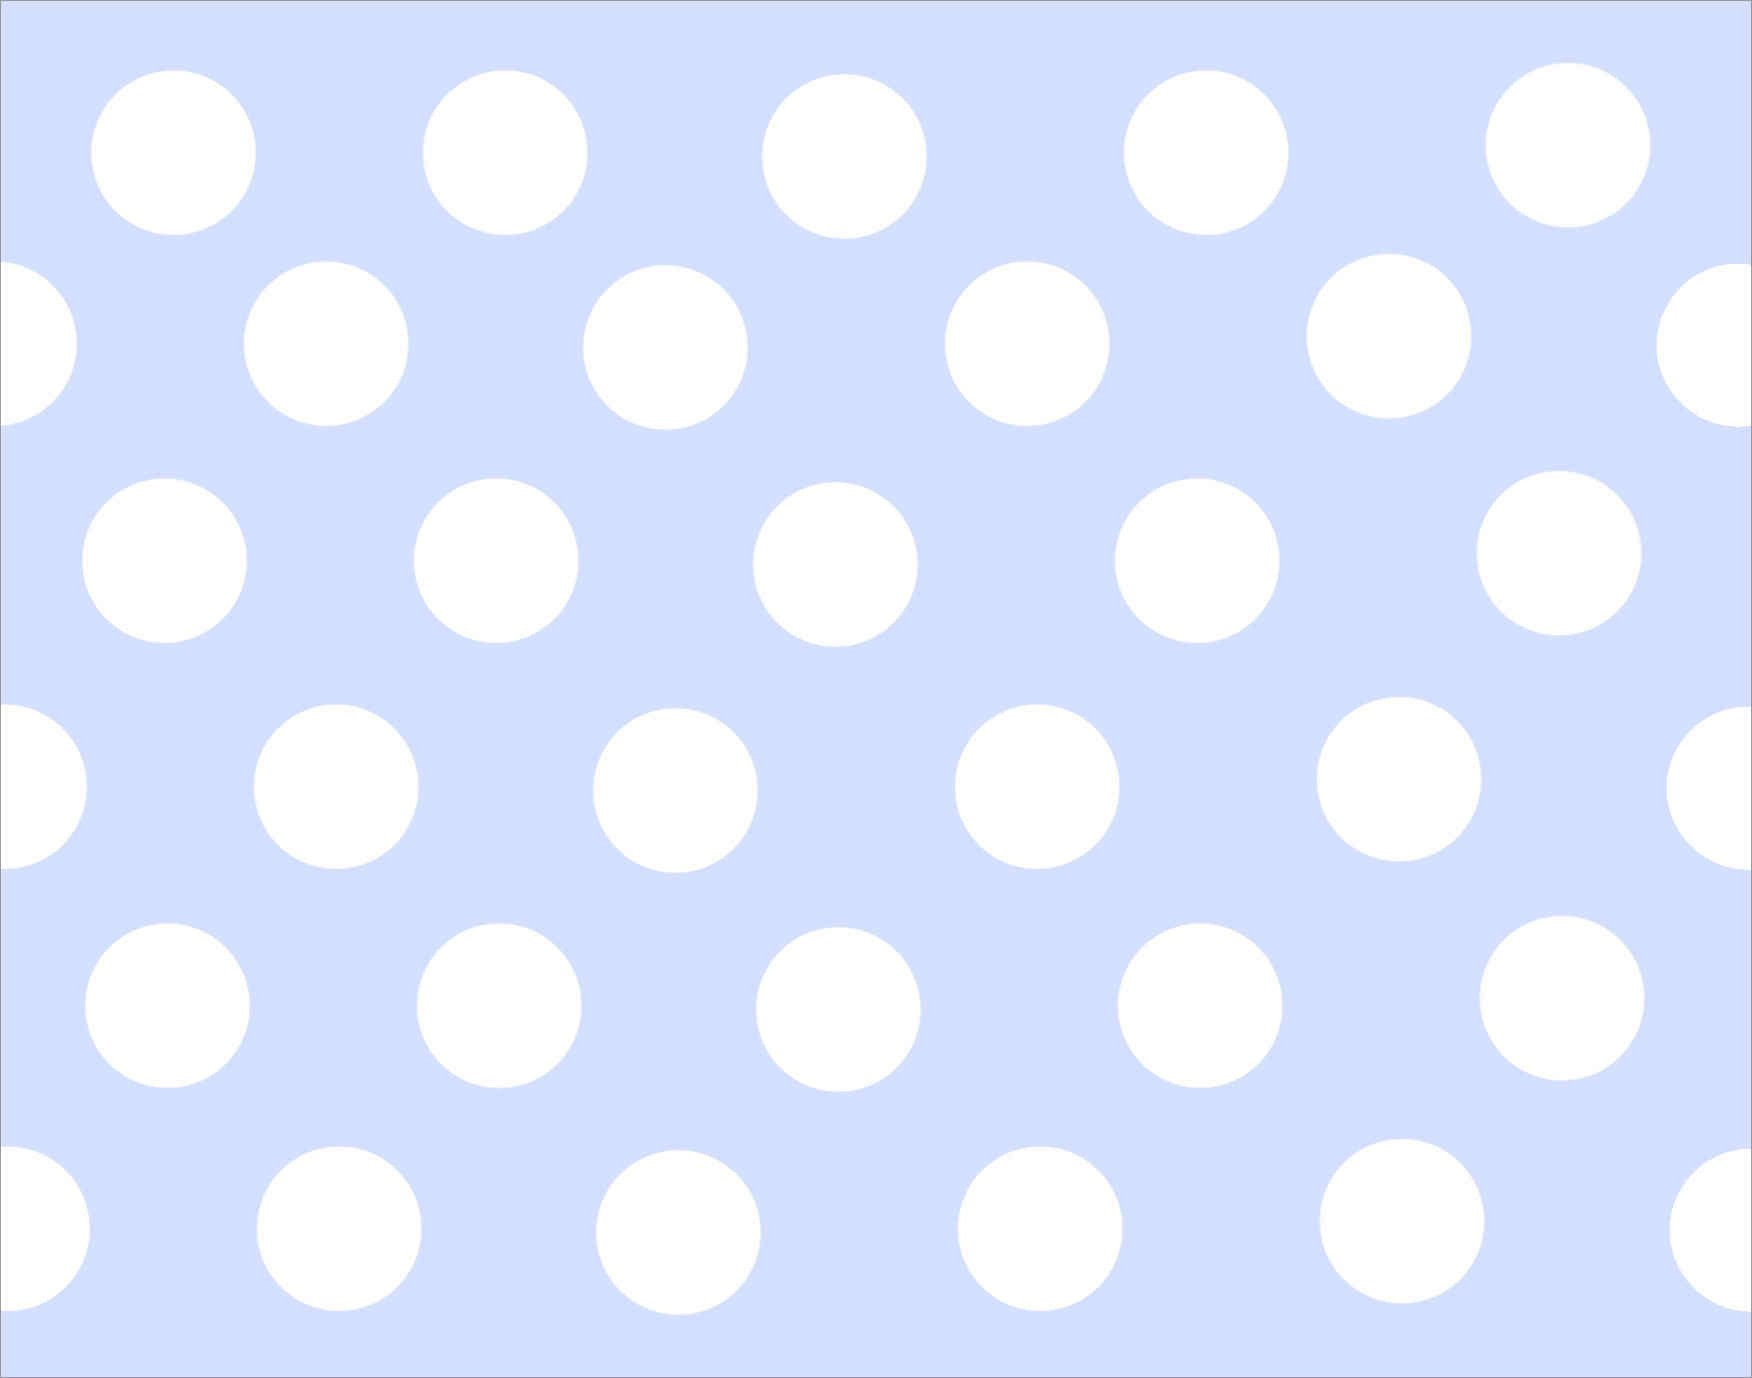 Cute Aqua Green Wallpaper 17 Blue Polka Dot Backgrounds Wallpapers Freecreatives